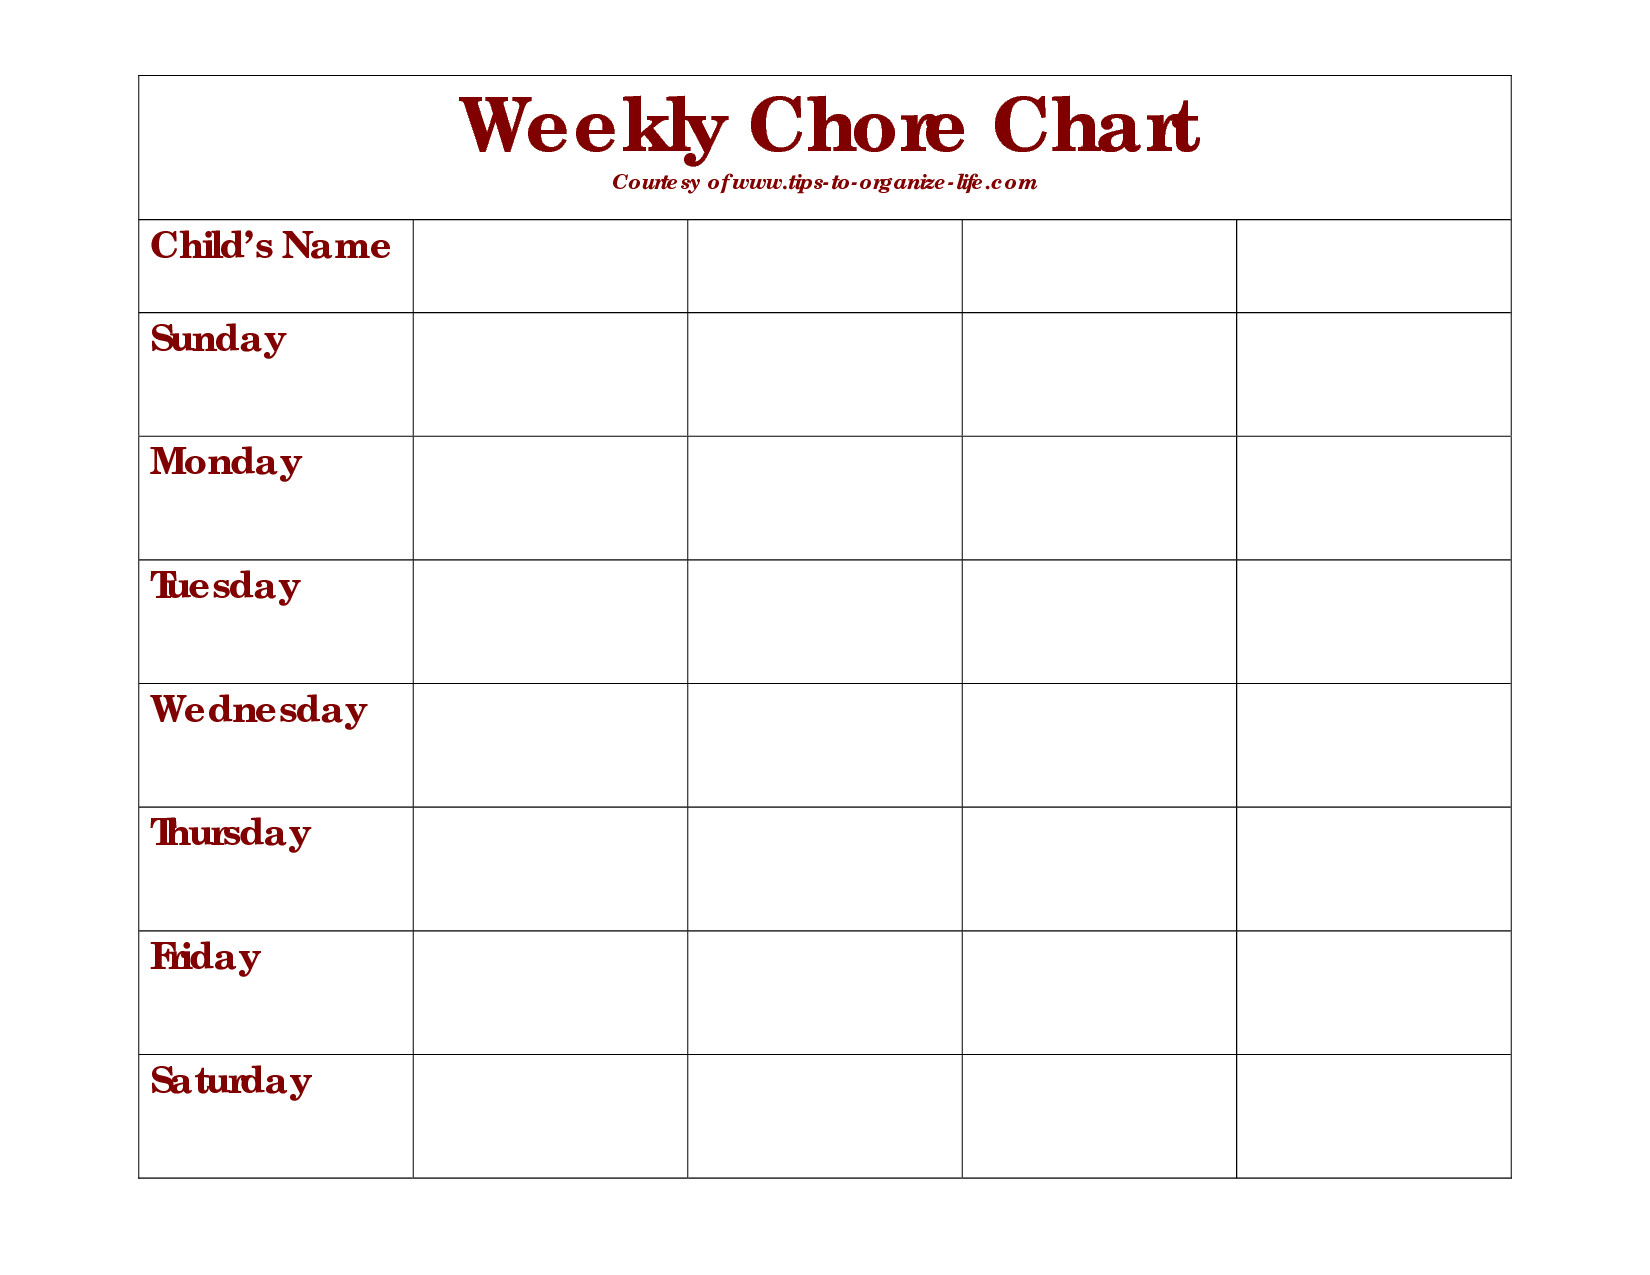 Free Printable Chore Chart Templates Weekly Chore Chart